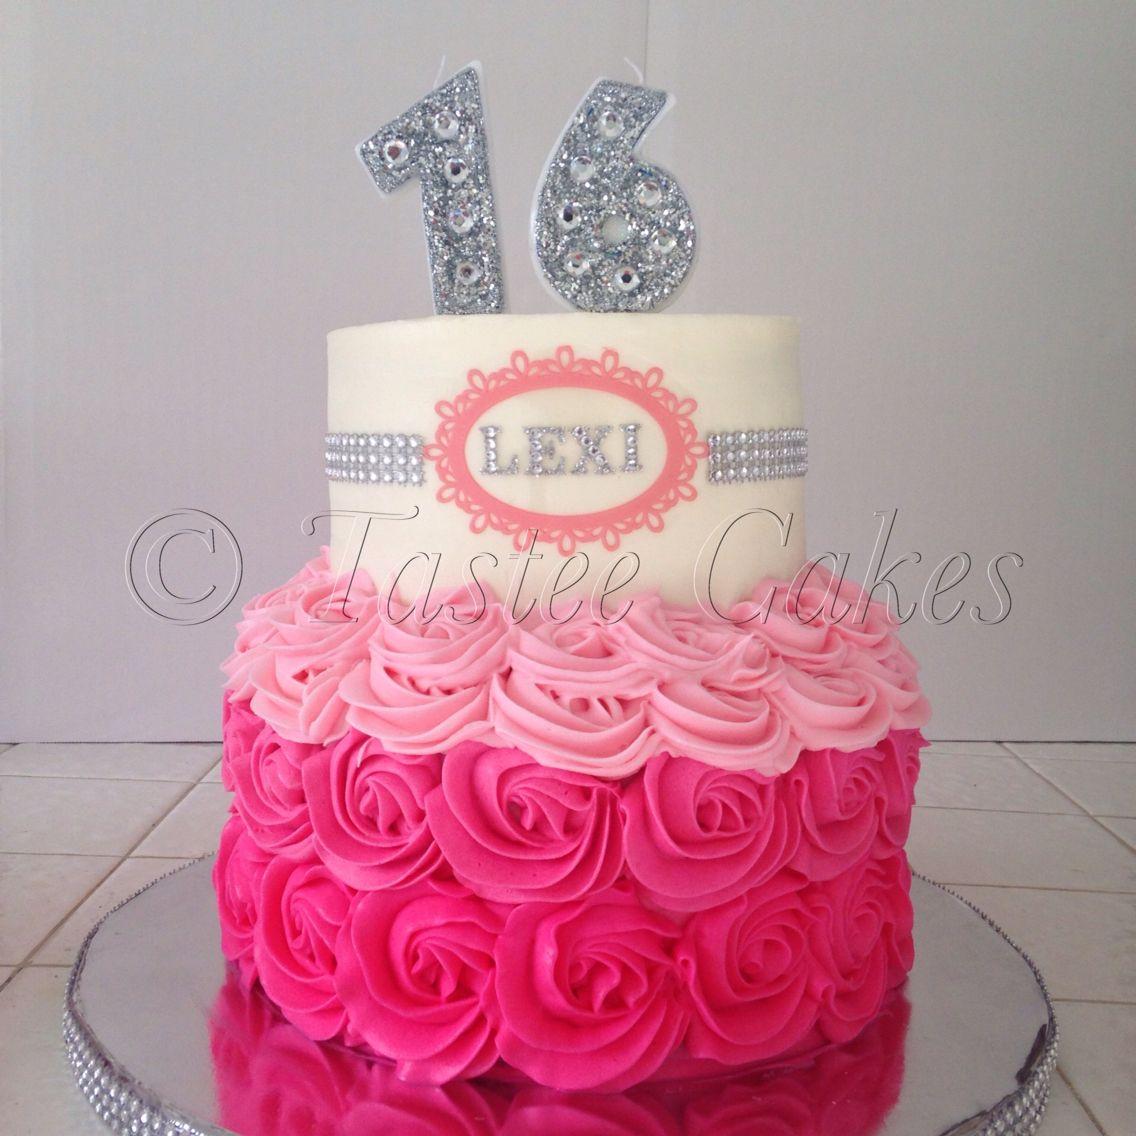 Bling Cake 16th Birthday Pink Cake Rosettes Teenage Cake Bling